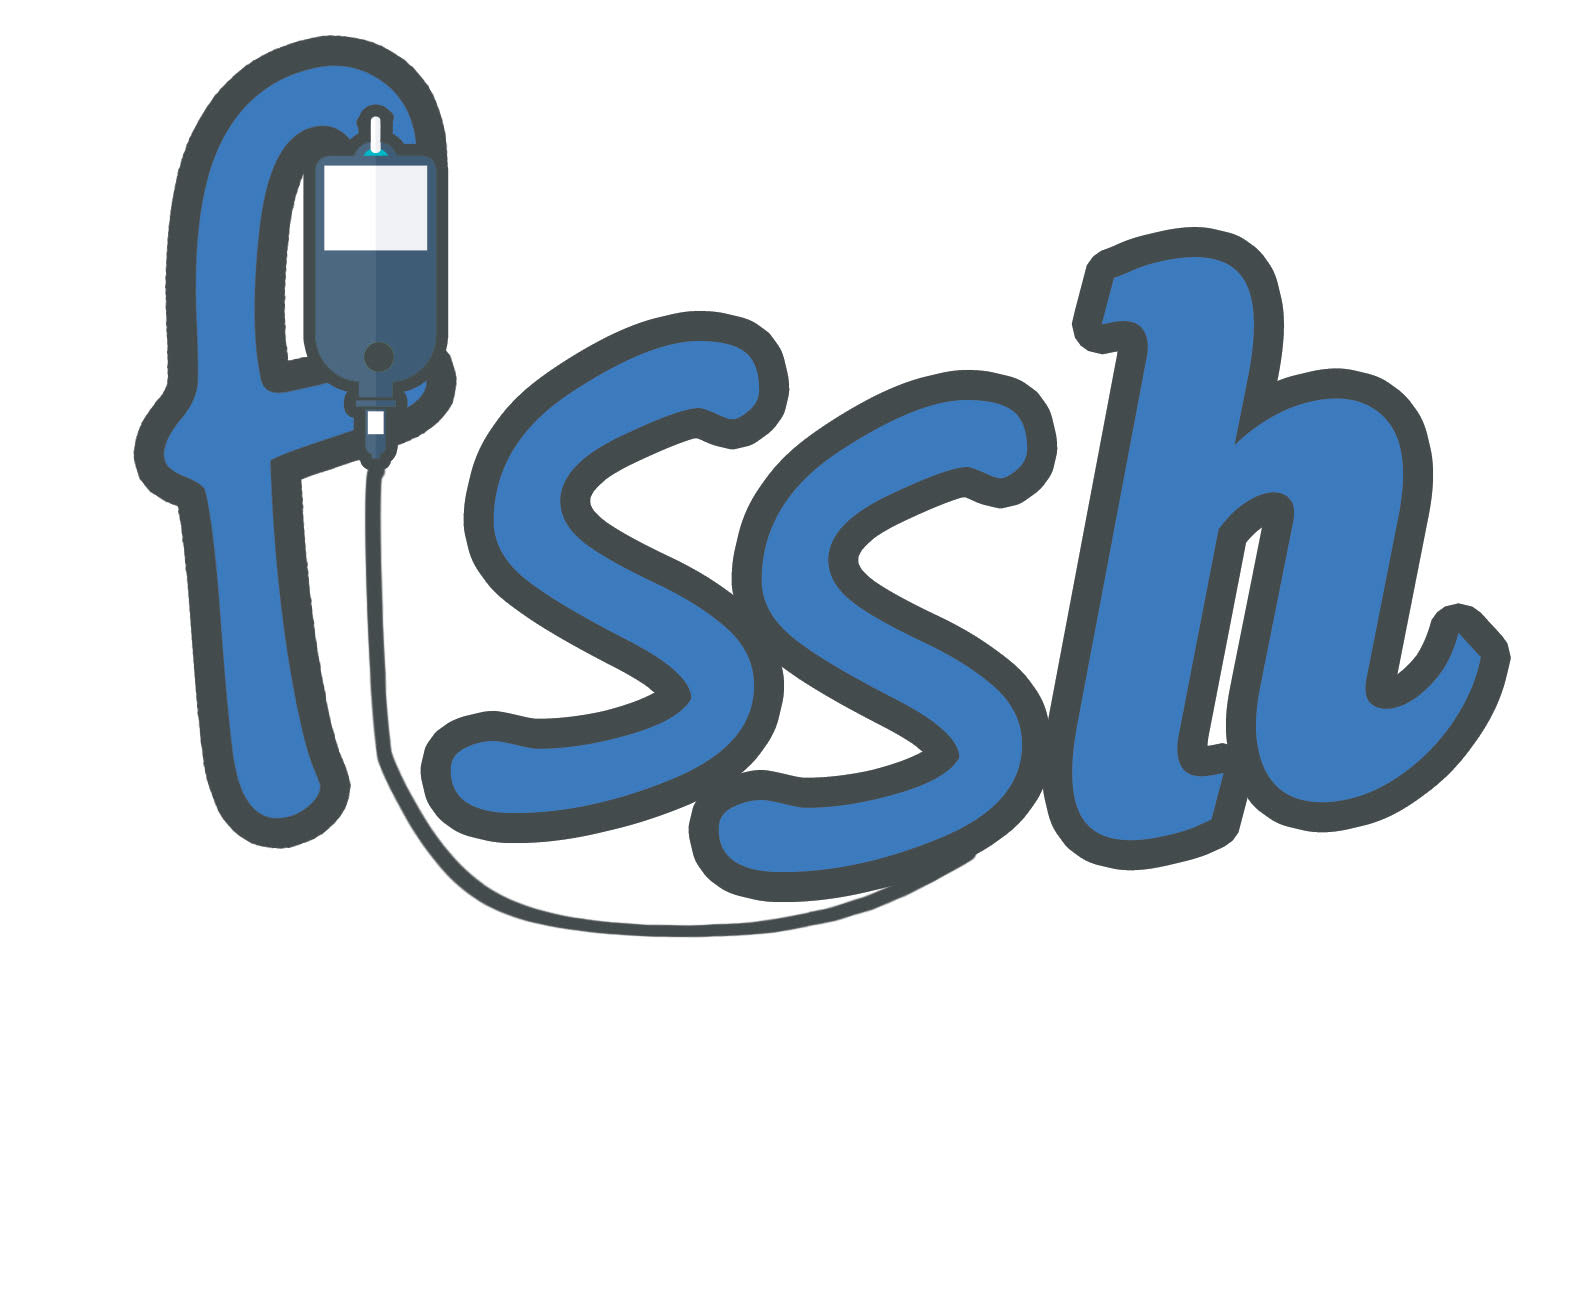 FISSH Logo 2.jpg